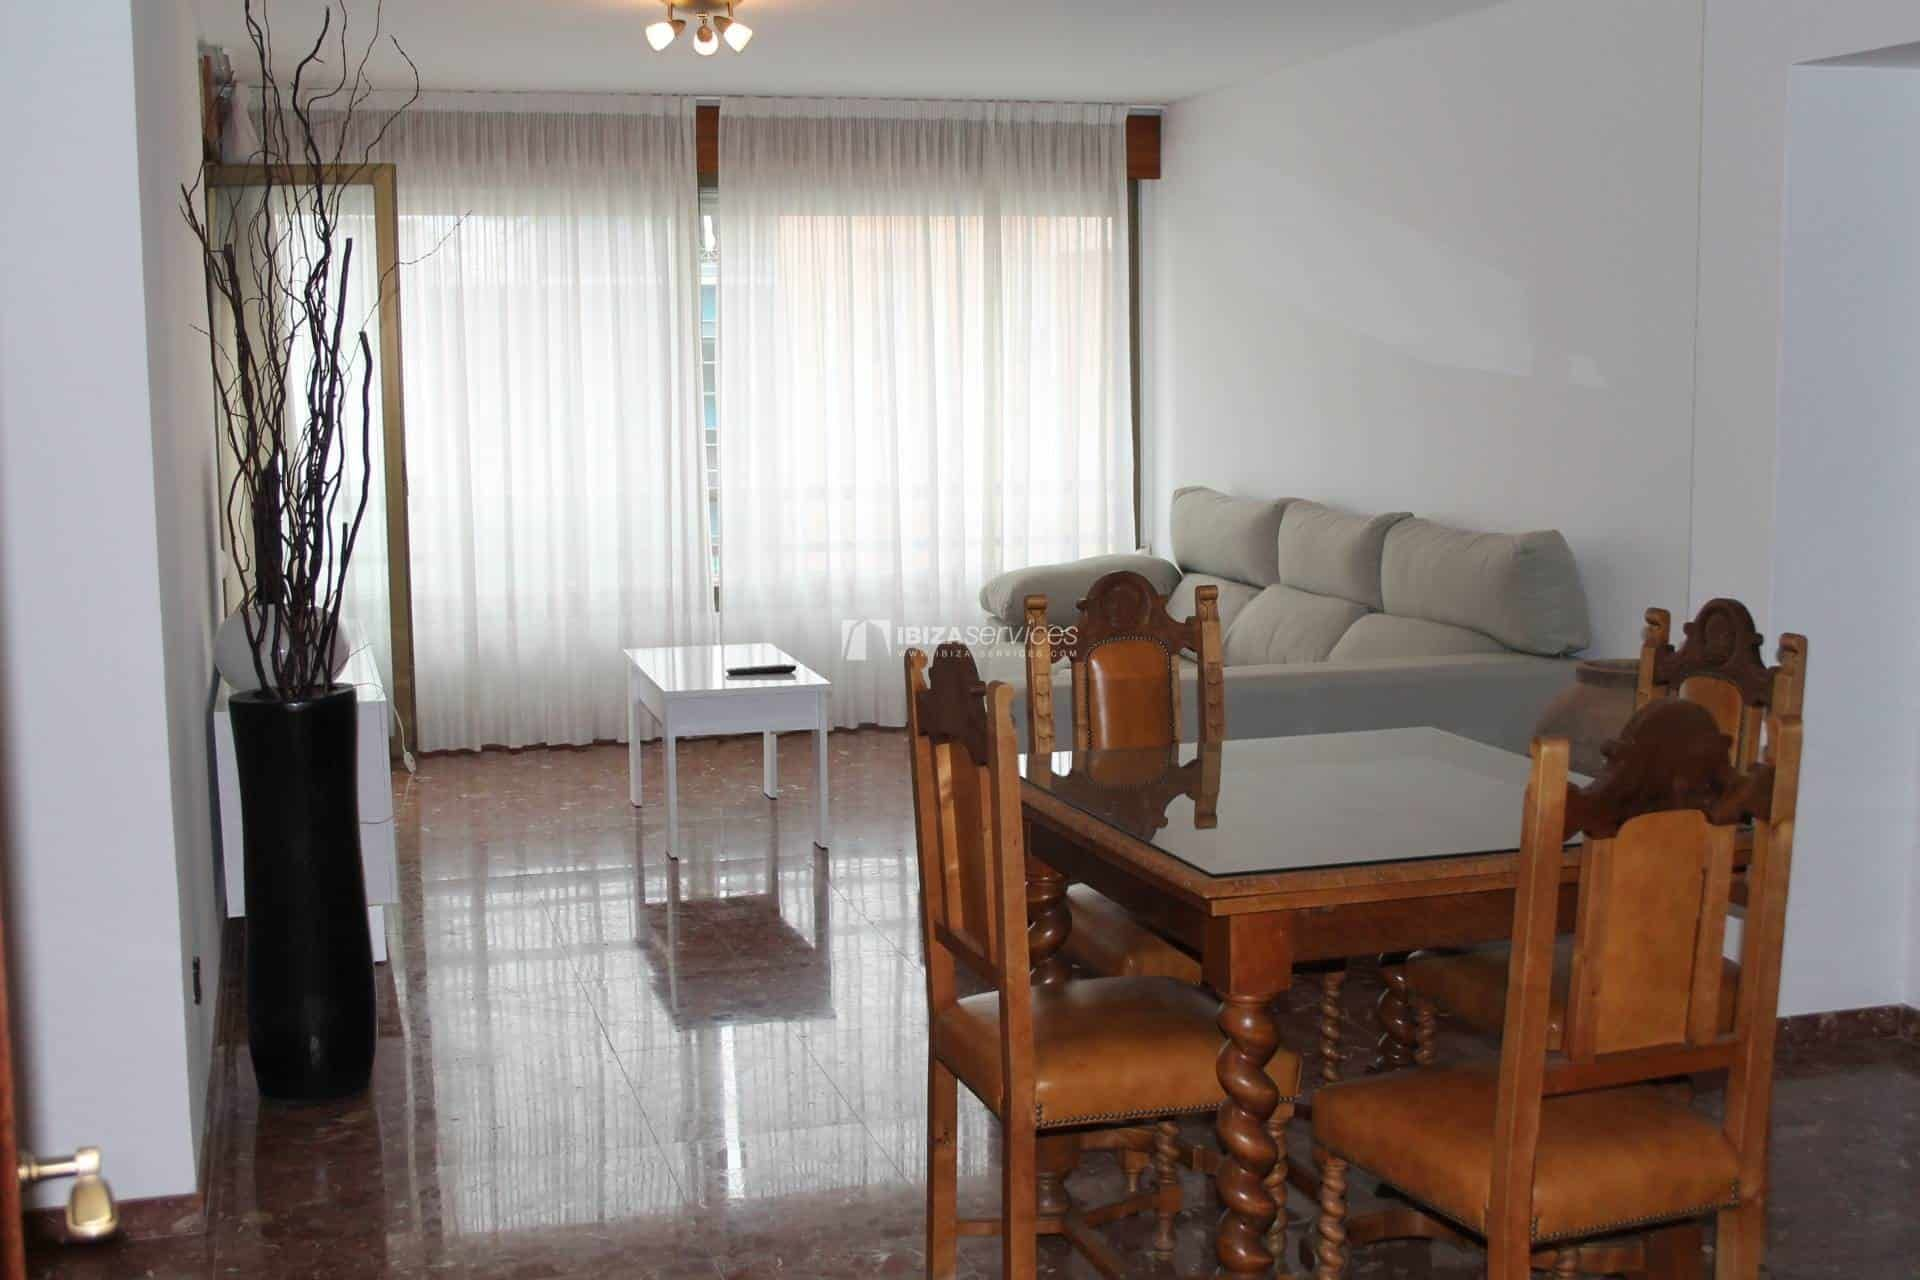 Apartamento 4 Dormitorios Centro Ibiza Alquiler De Temporada En 2020 Dormitorios Apartamentos Decoracion Hogar